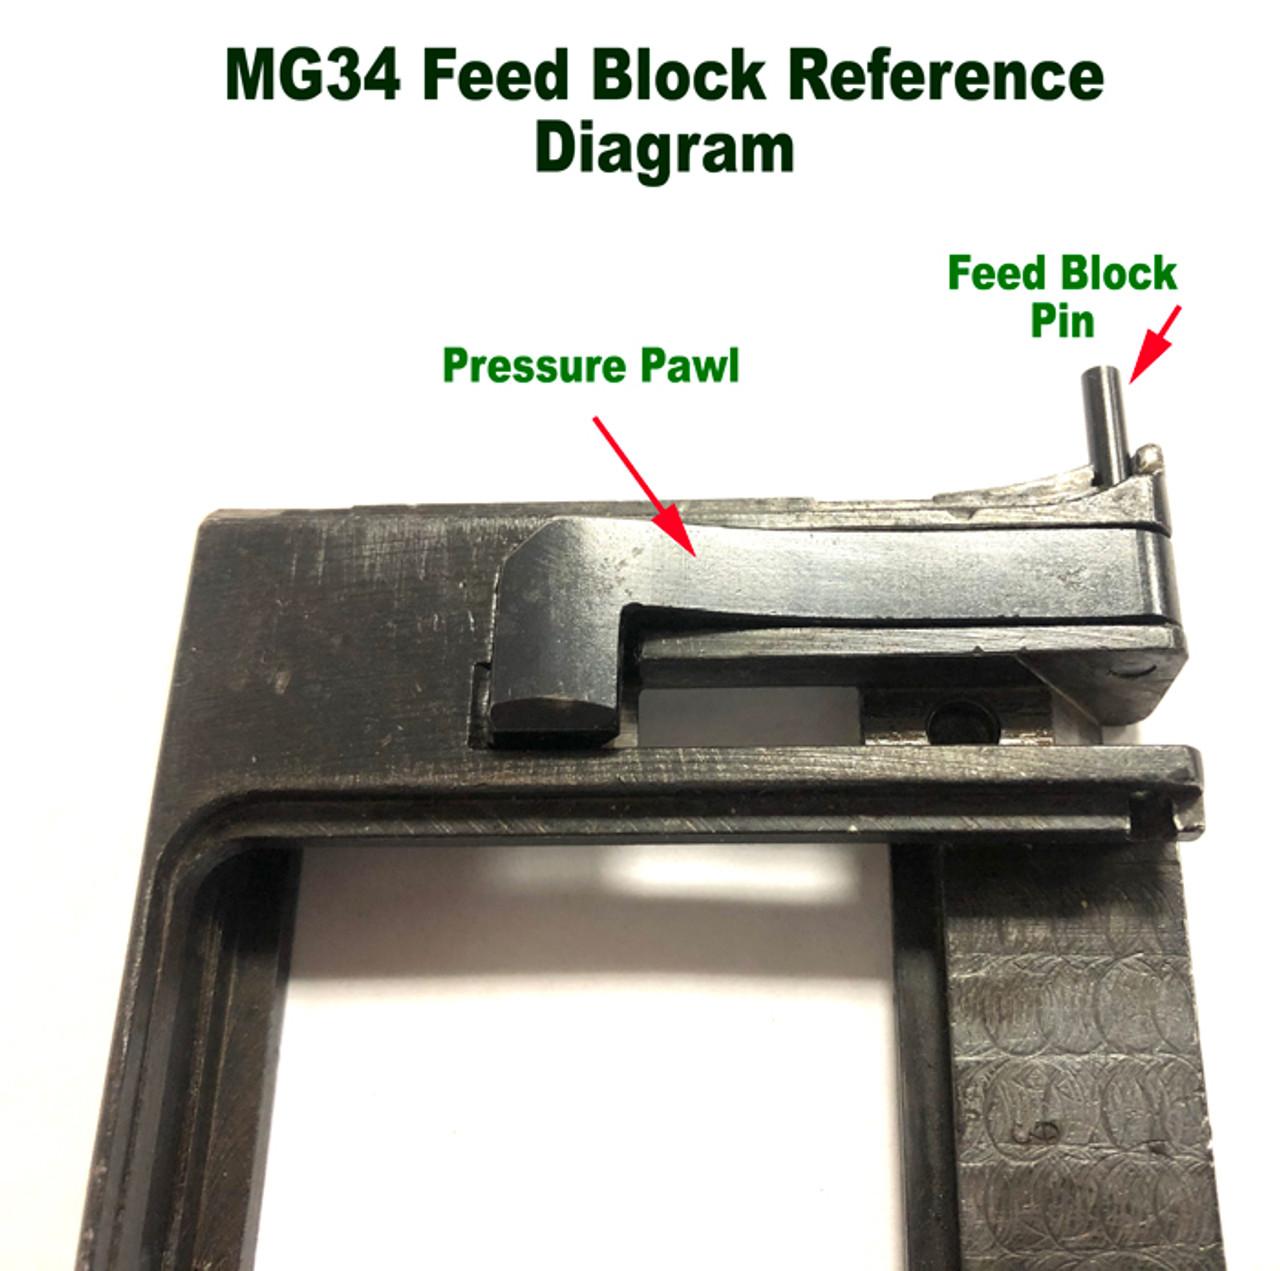 MG34 Pressure Pawl Spring